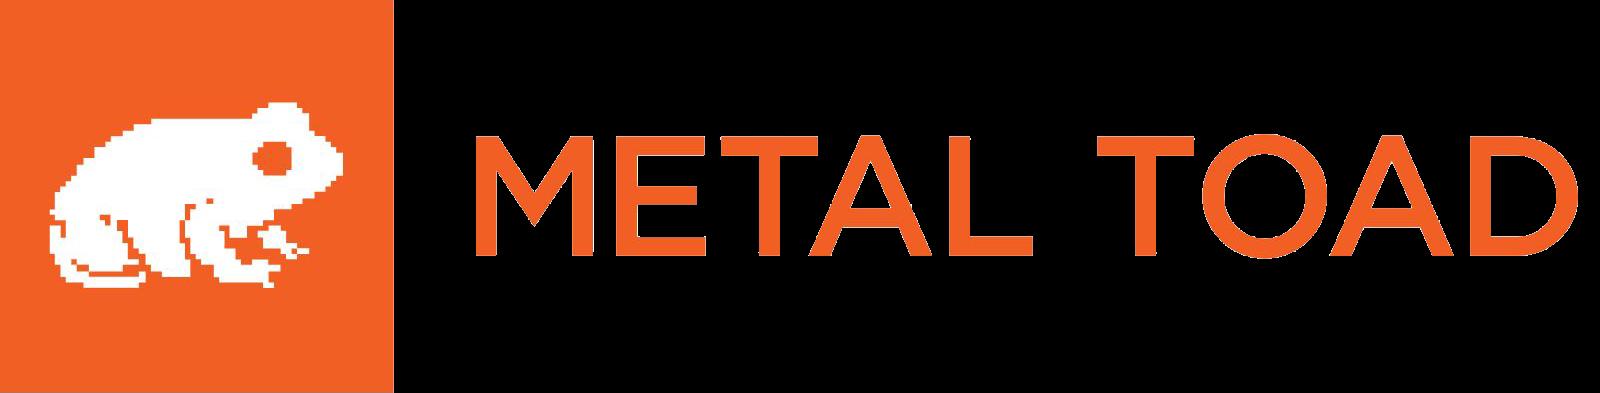 Sponsor Metal Toad.png